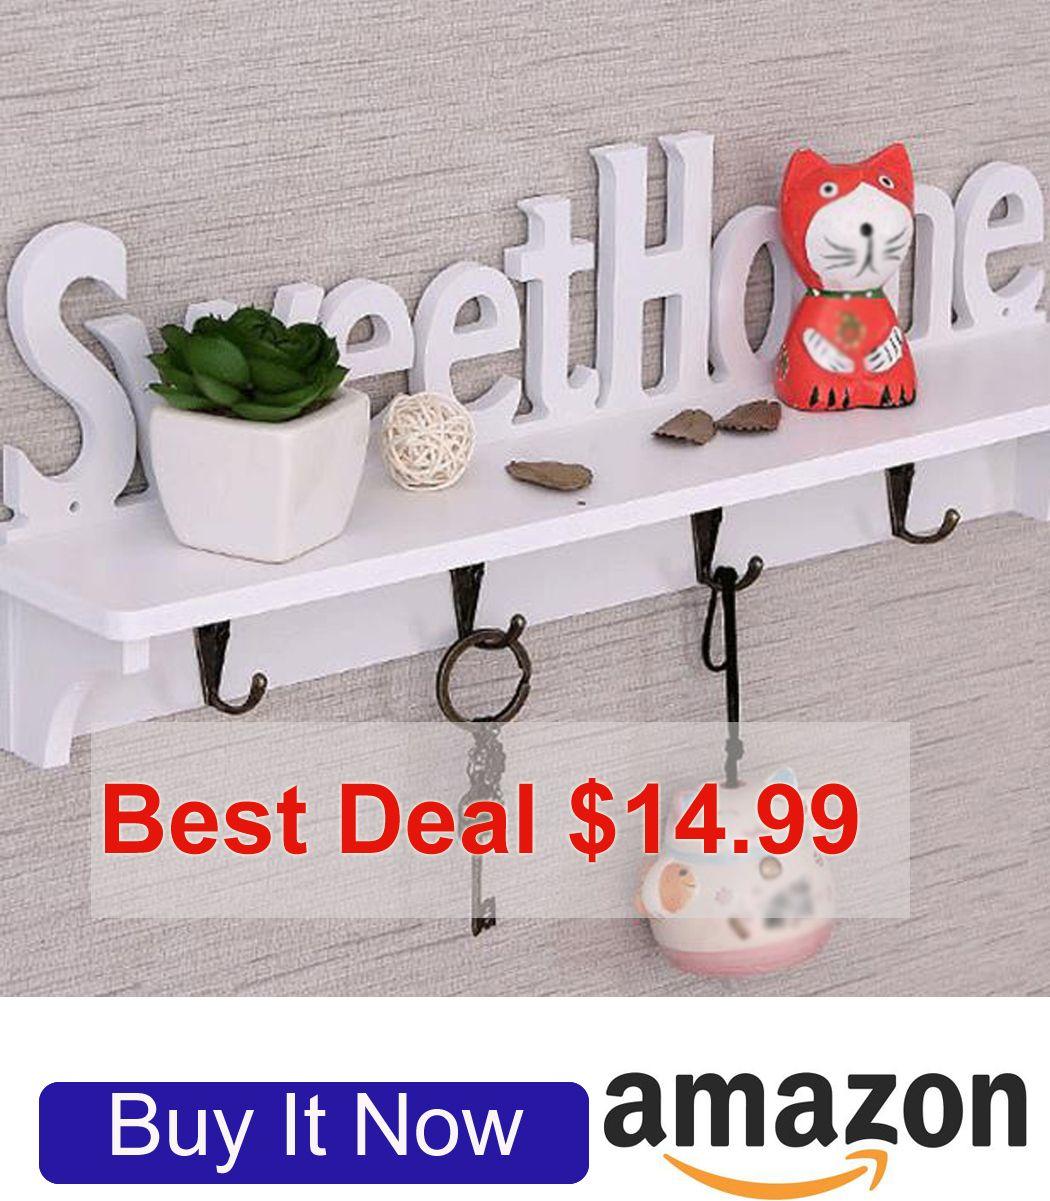 14 99 Christmasgift Key Holder For Wall Towel Rack 4 Hooks Sweethome White Home Dorm Decorative Wall Towel Racks Ebay Decor